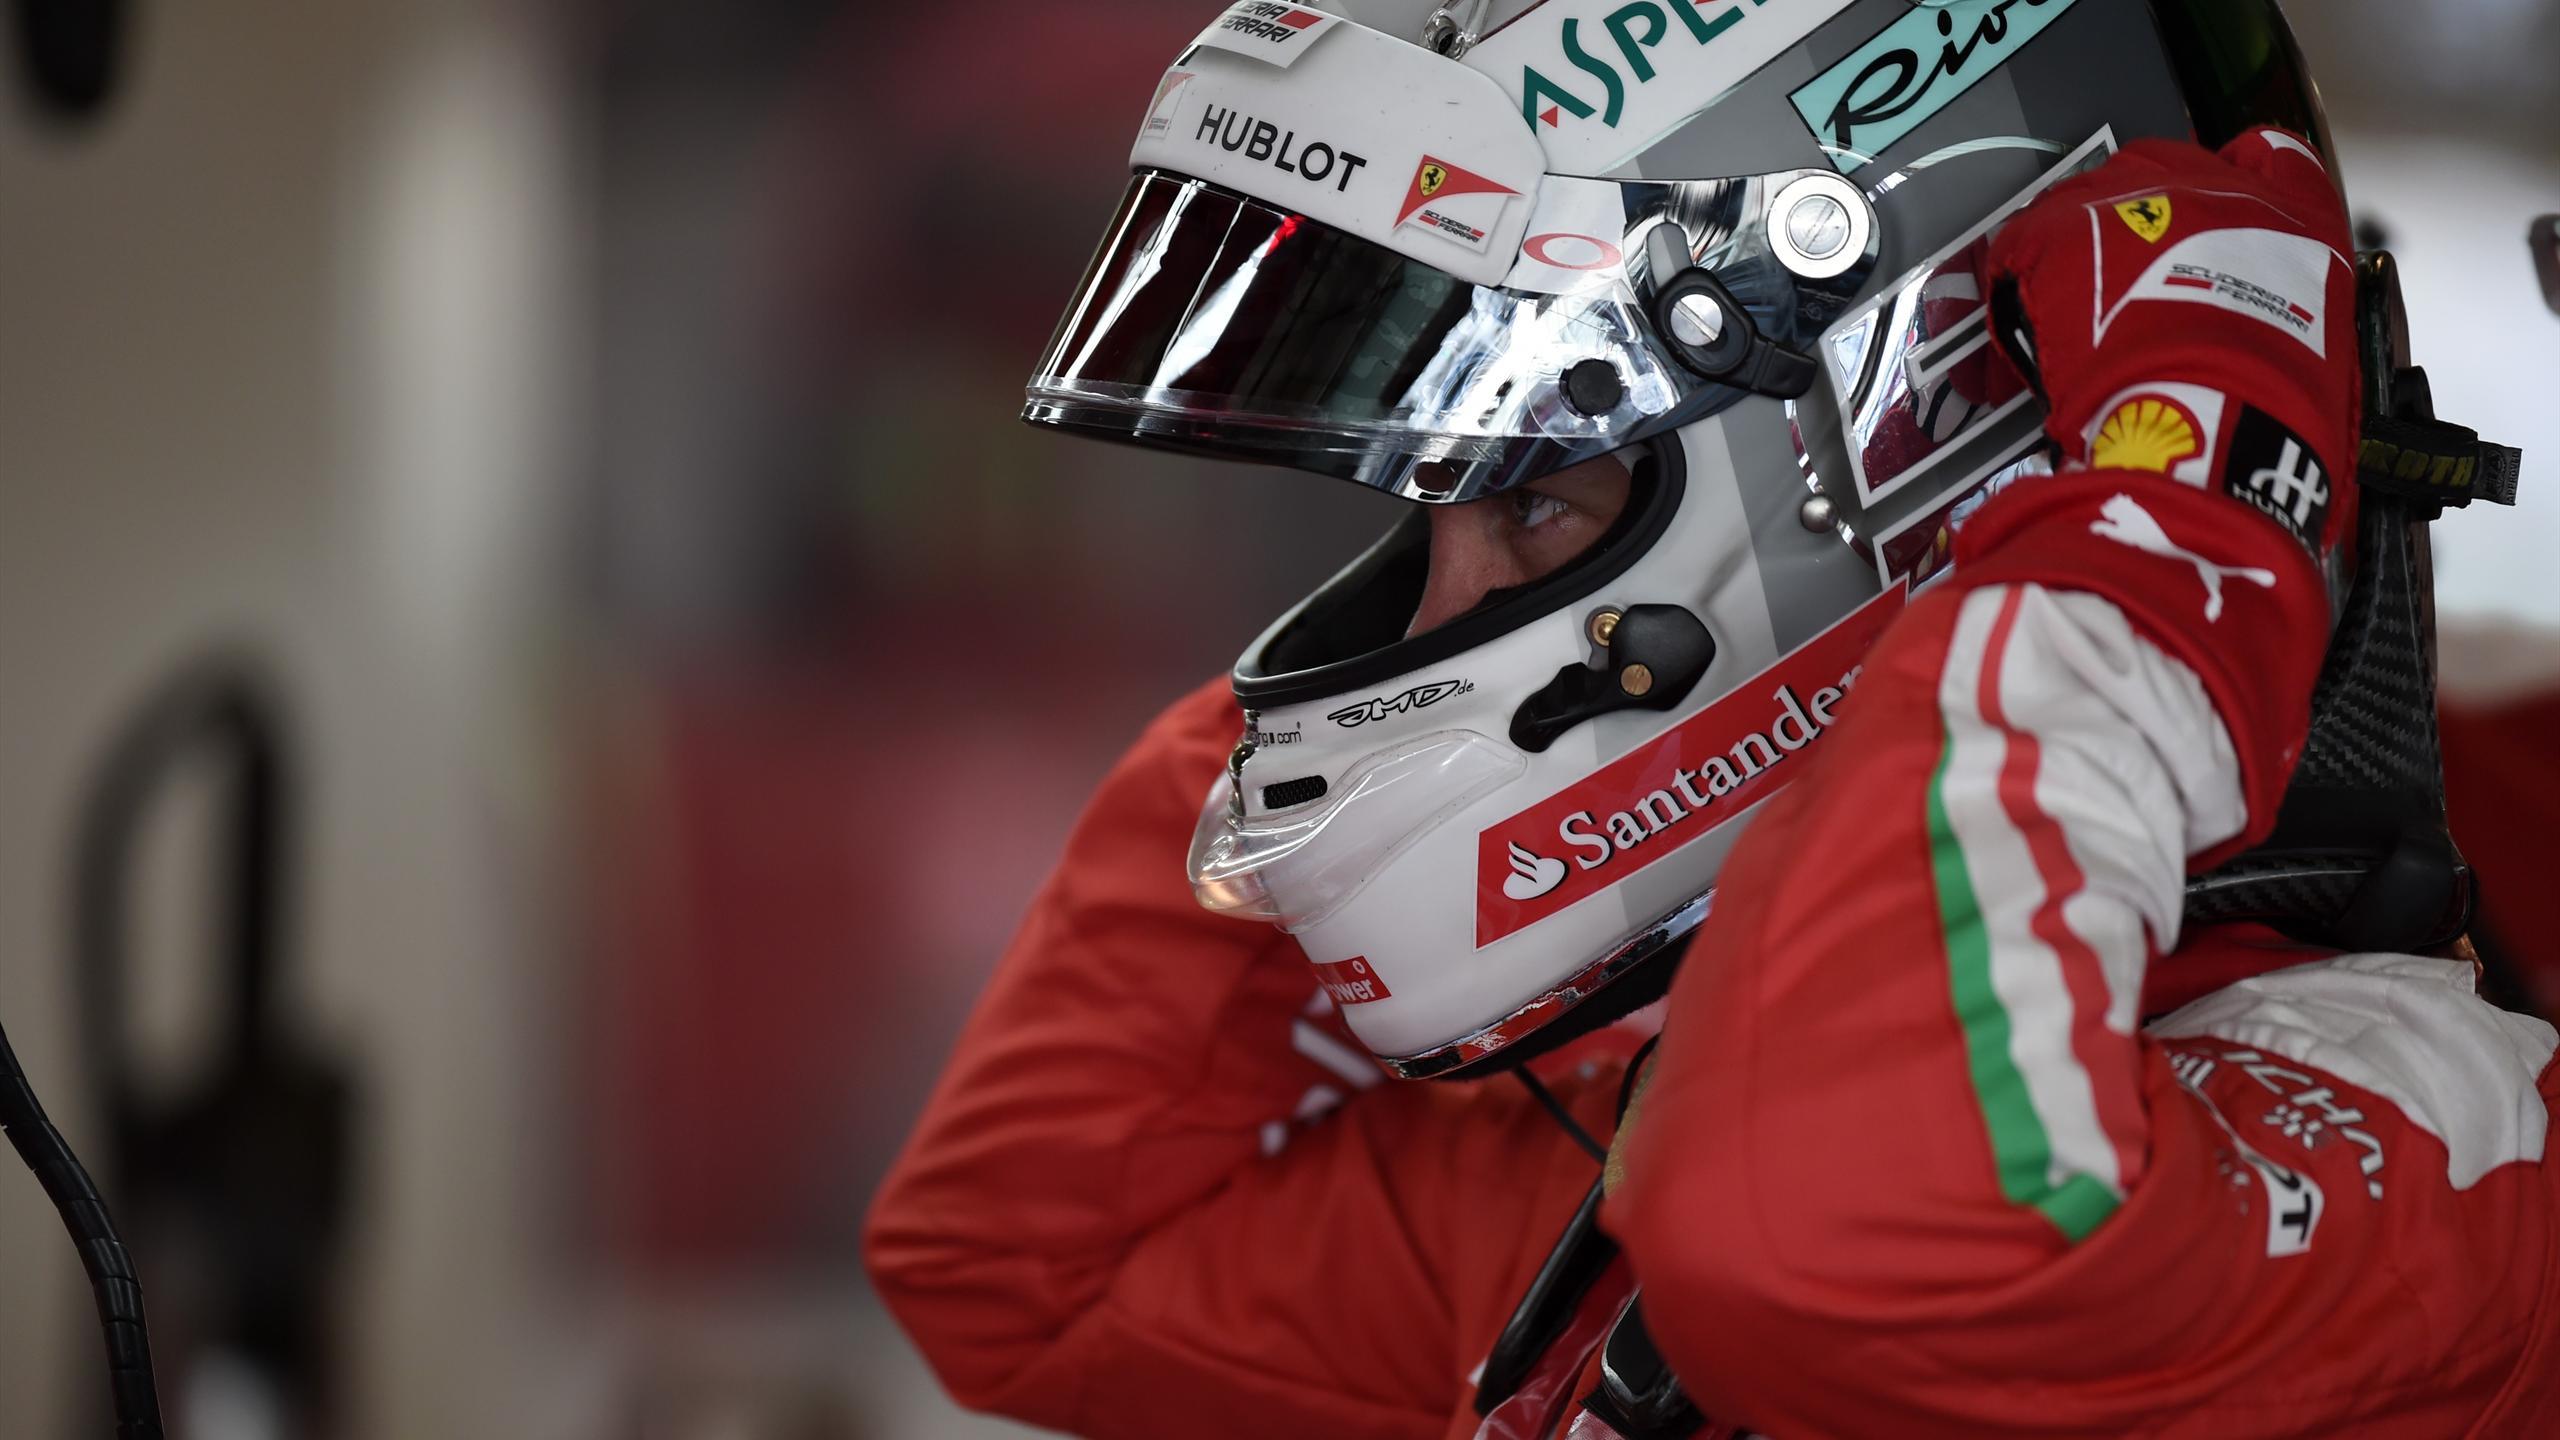 Sebastian Vettel (Ferrari) lors du Grand Prix d'Abou Dabi 2016